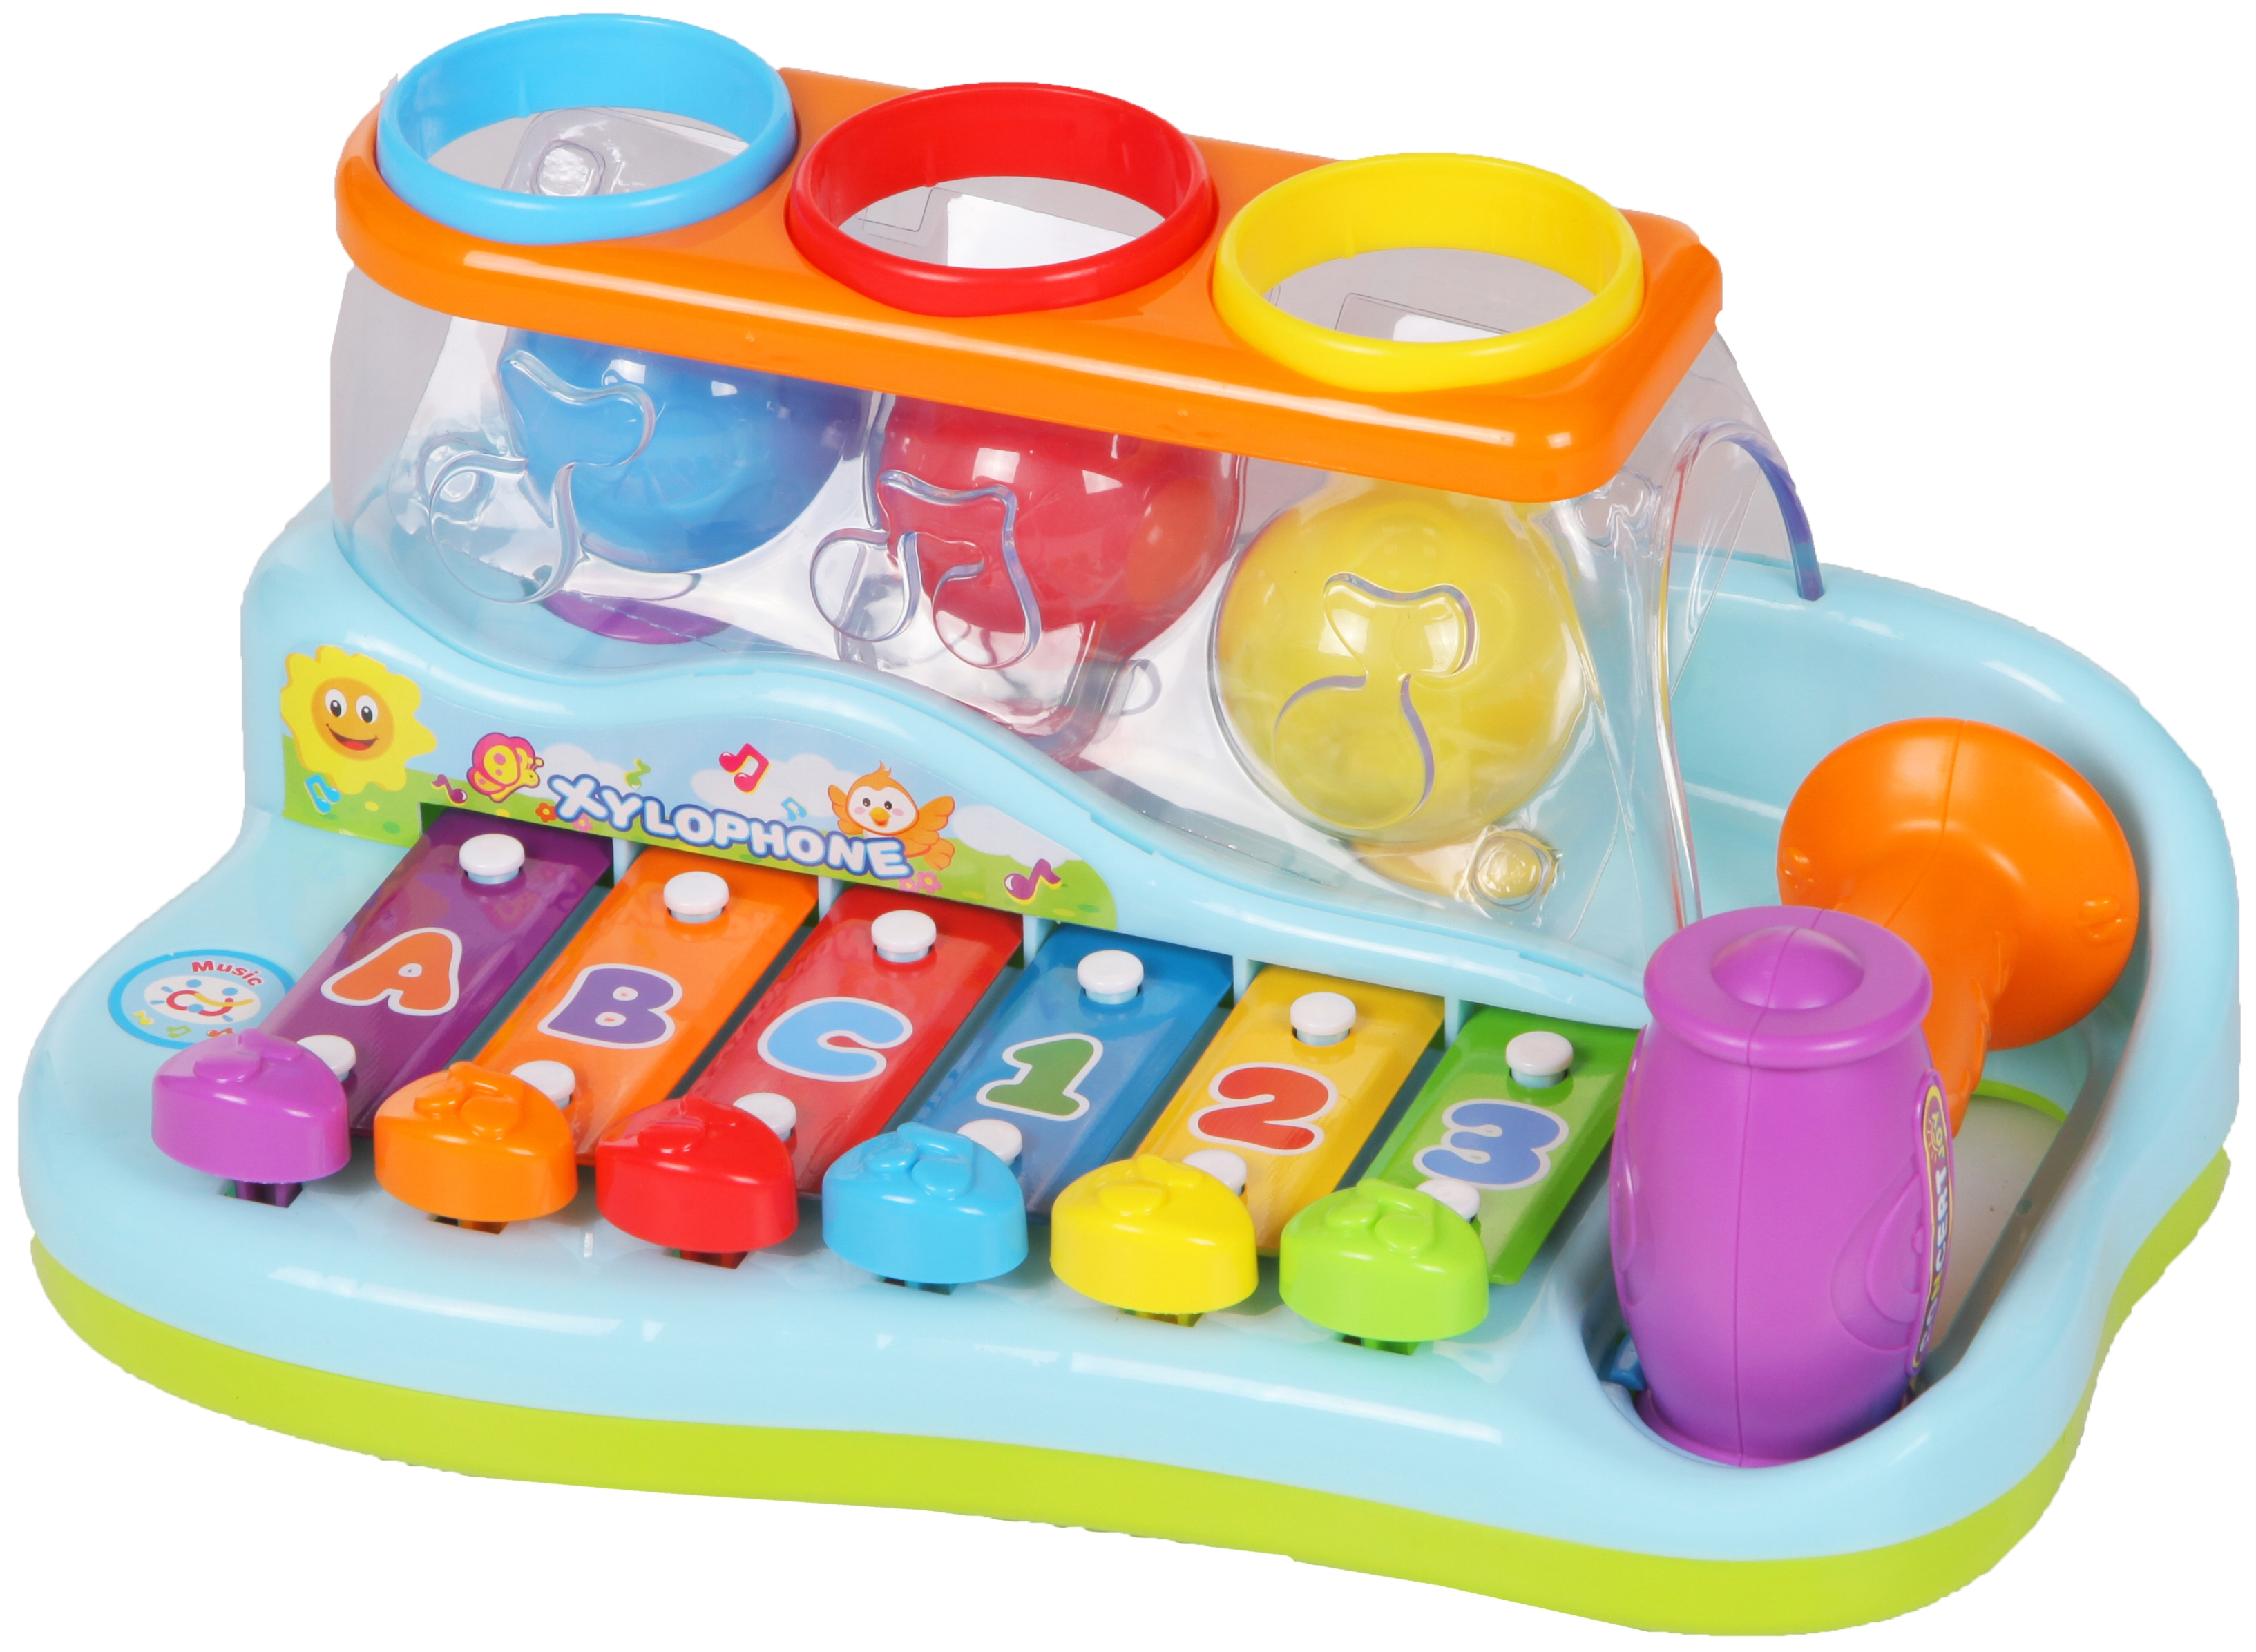 Развивающие игрушки Huile Plastik Toys Ксилофон с молоточком и шарами Y61066 цена